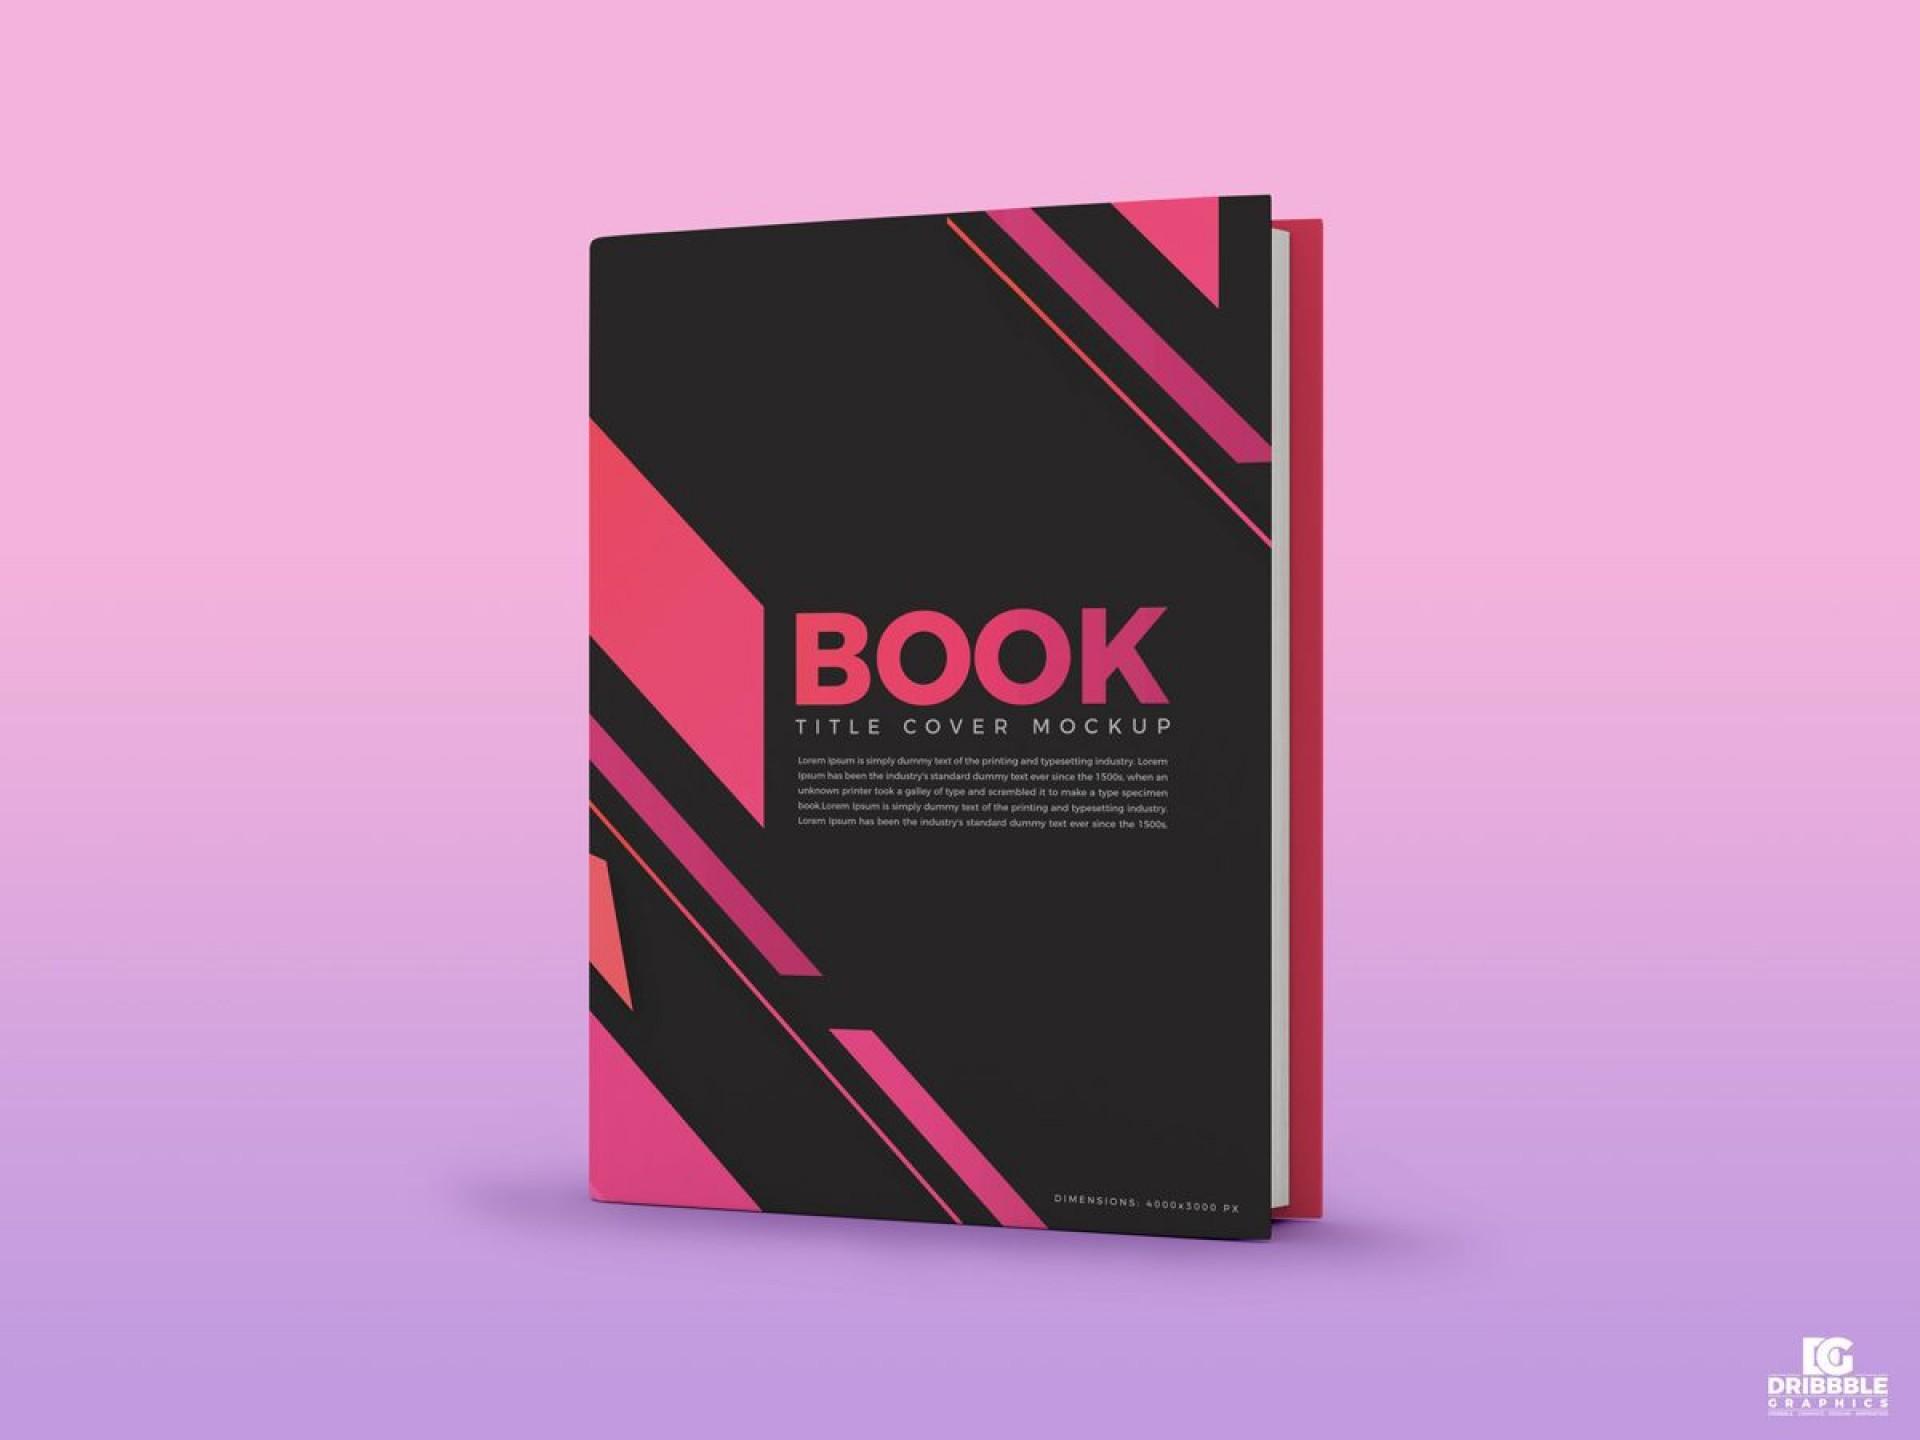 004 Astounding Book Cover Template Free Download Idea  Illustrator Design Vector Illustration1920